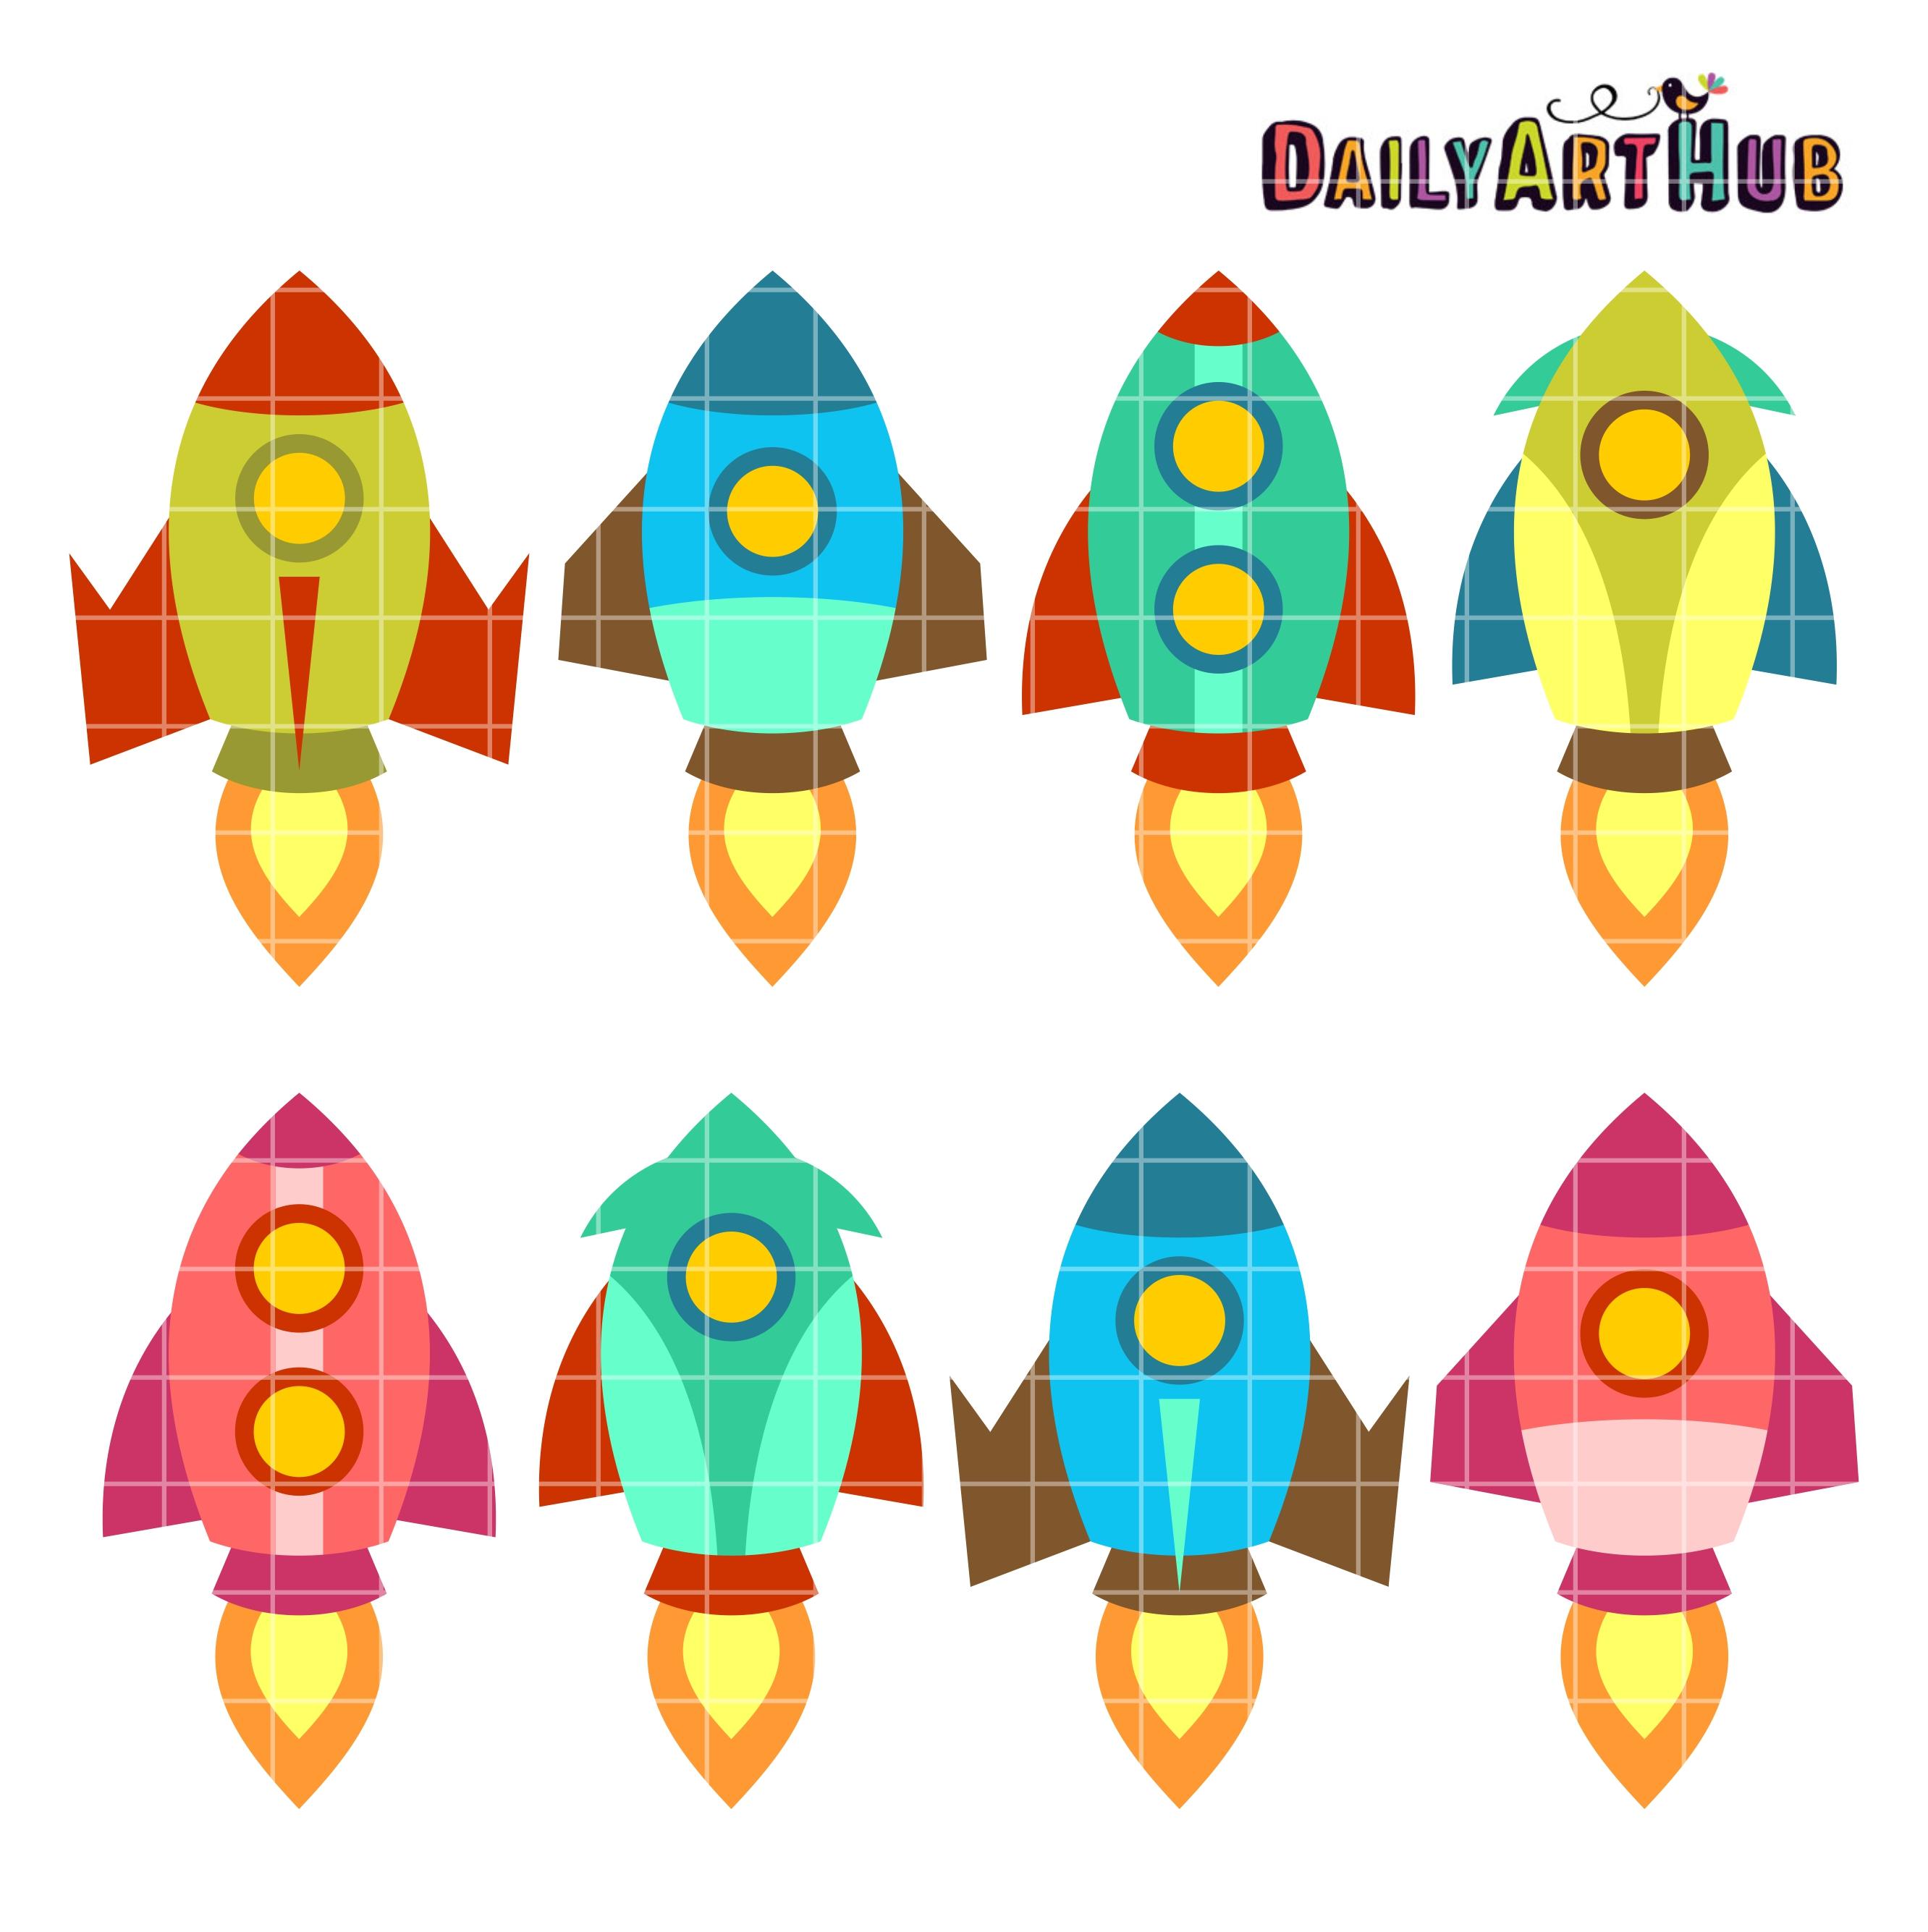 2664x2670 Old School Rocket Ships Clip Art Set Daily Art Hub Free Clip